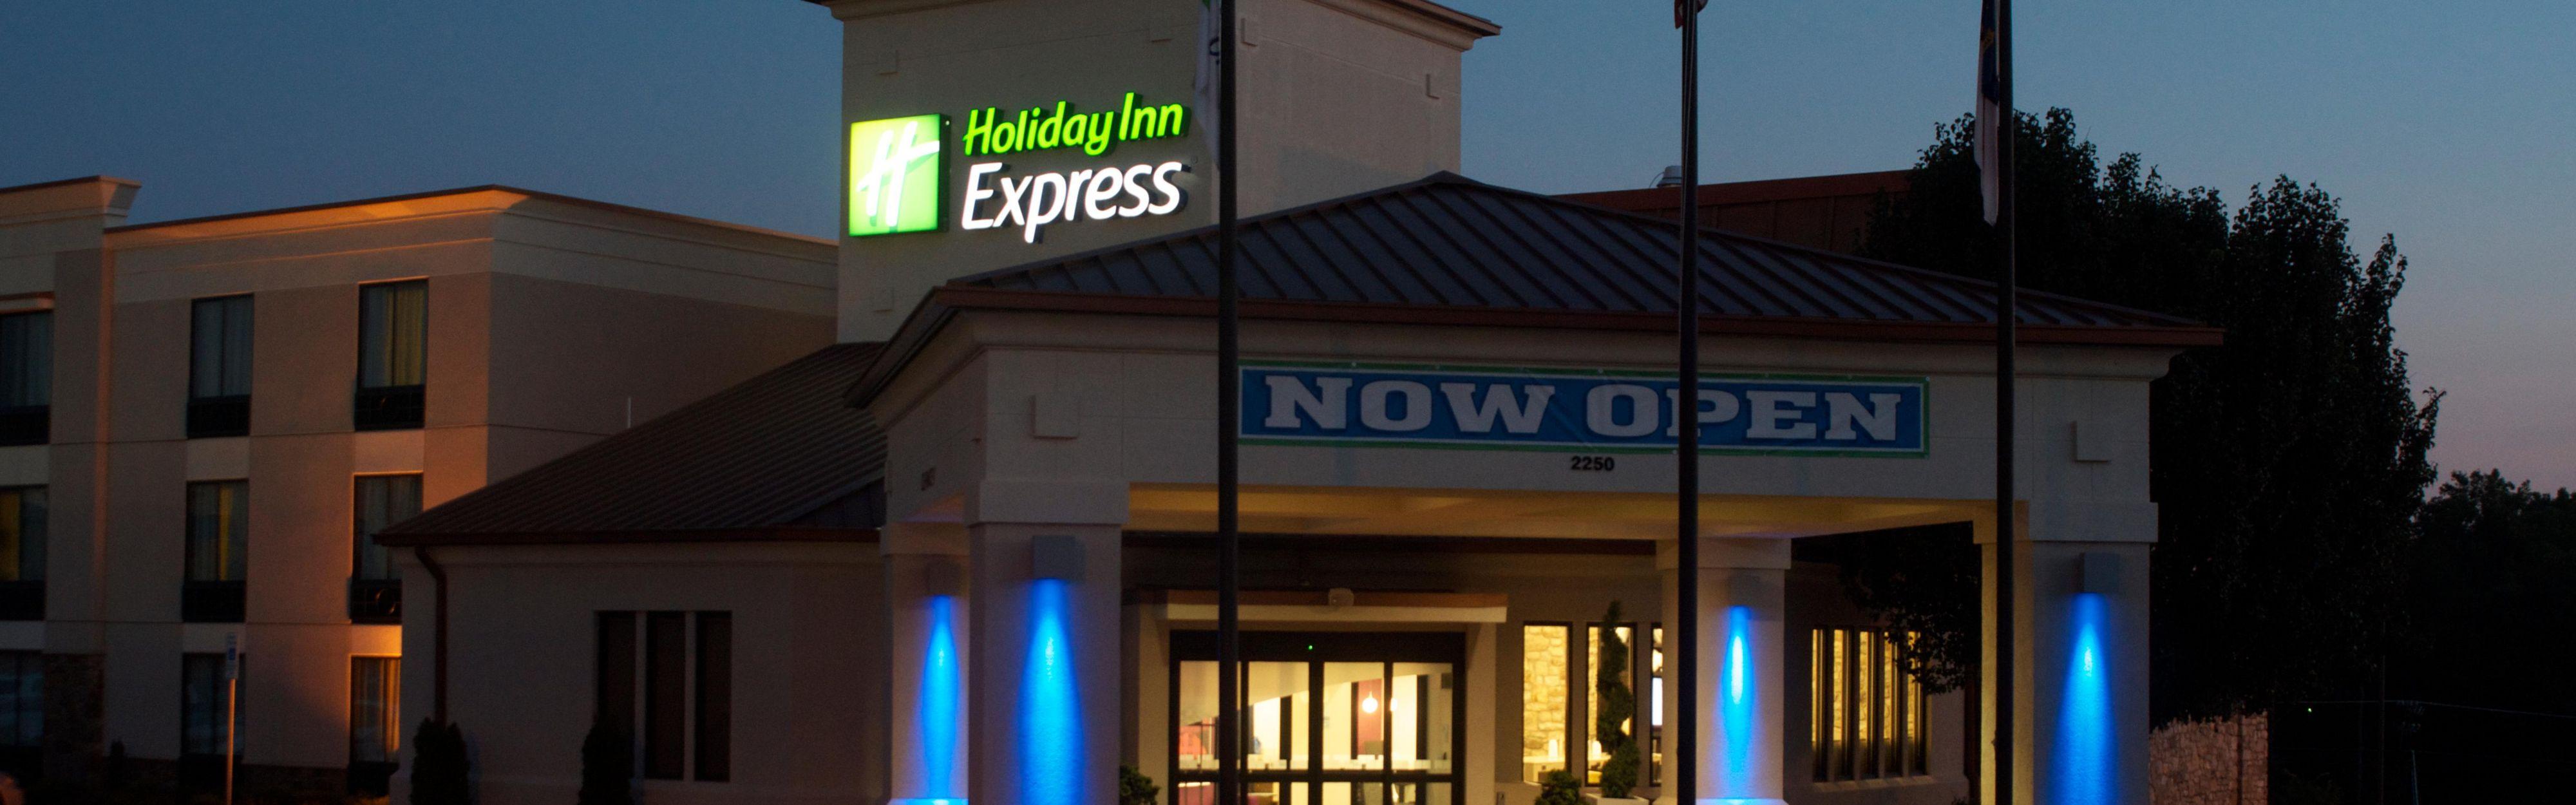 Holiday Inn Express Hickory-Hickory Mart image 0